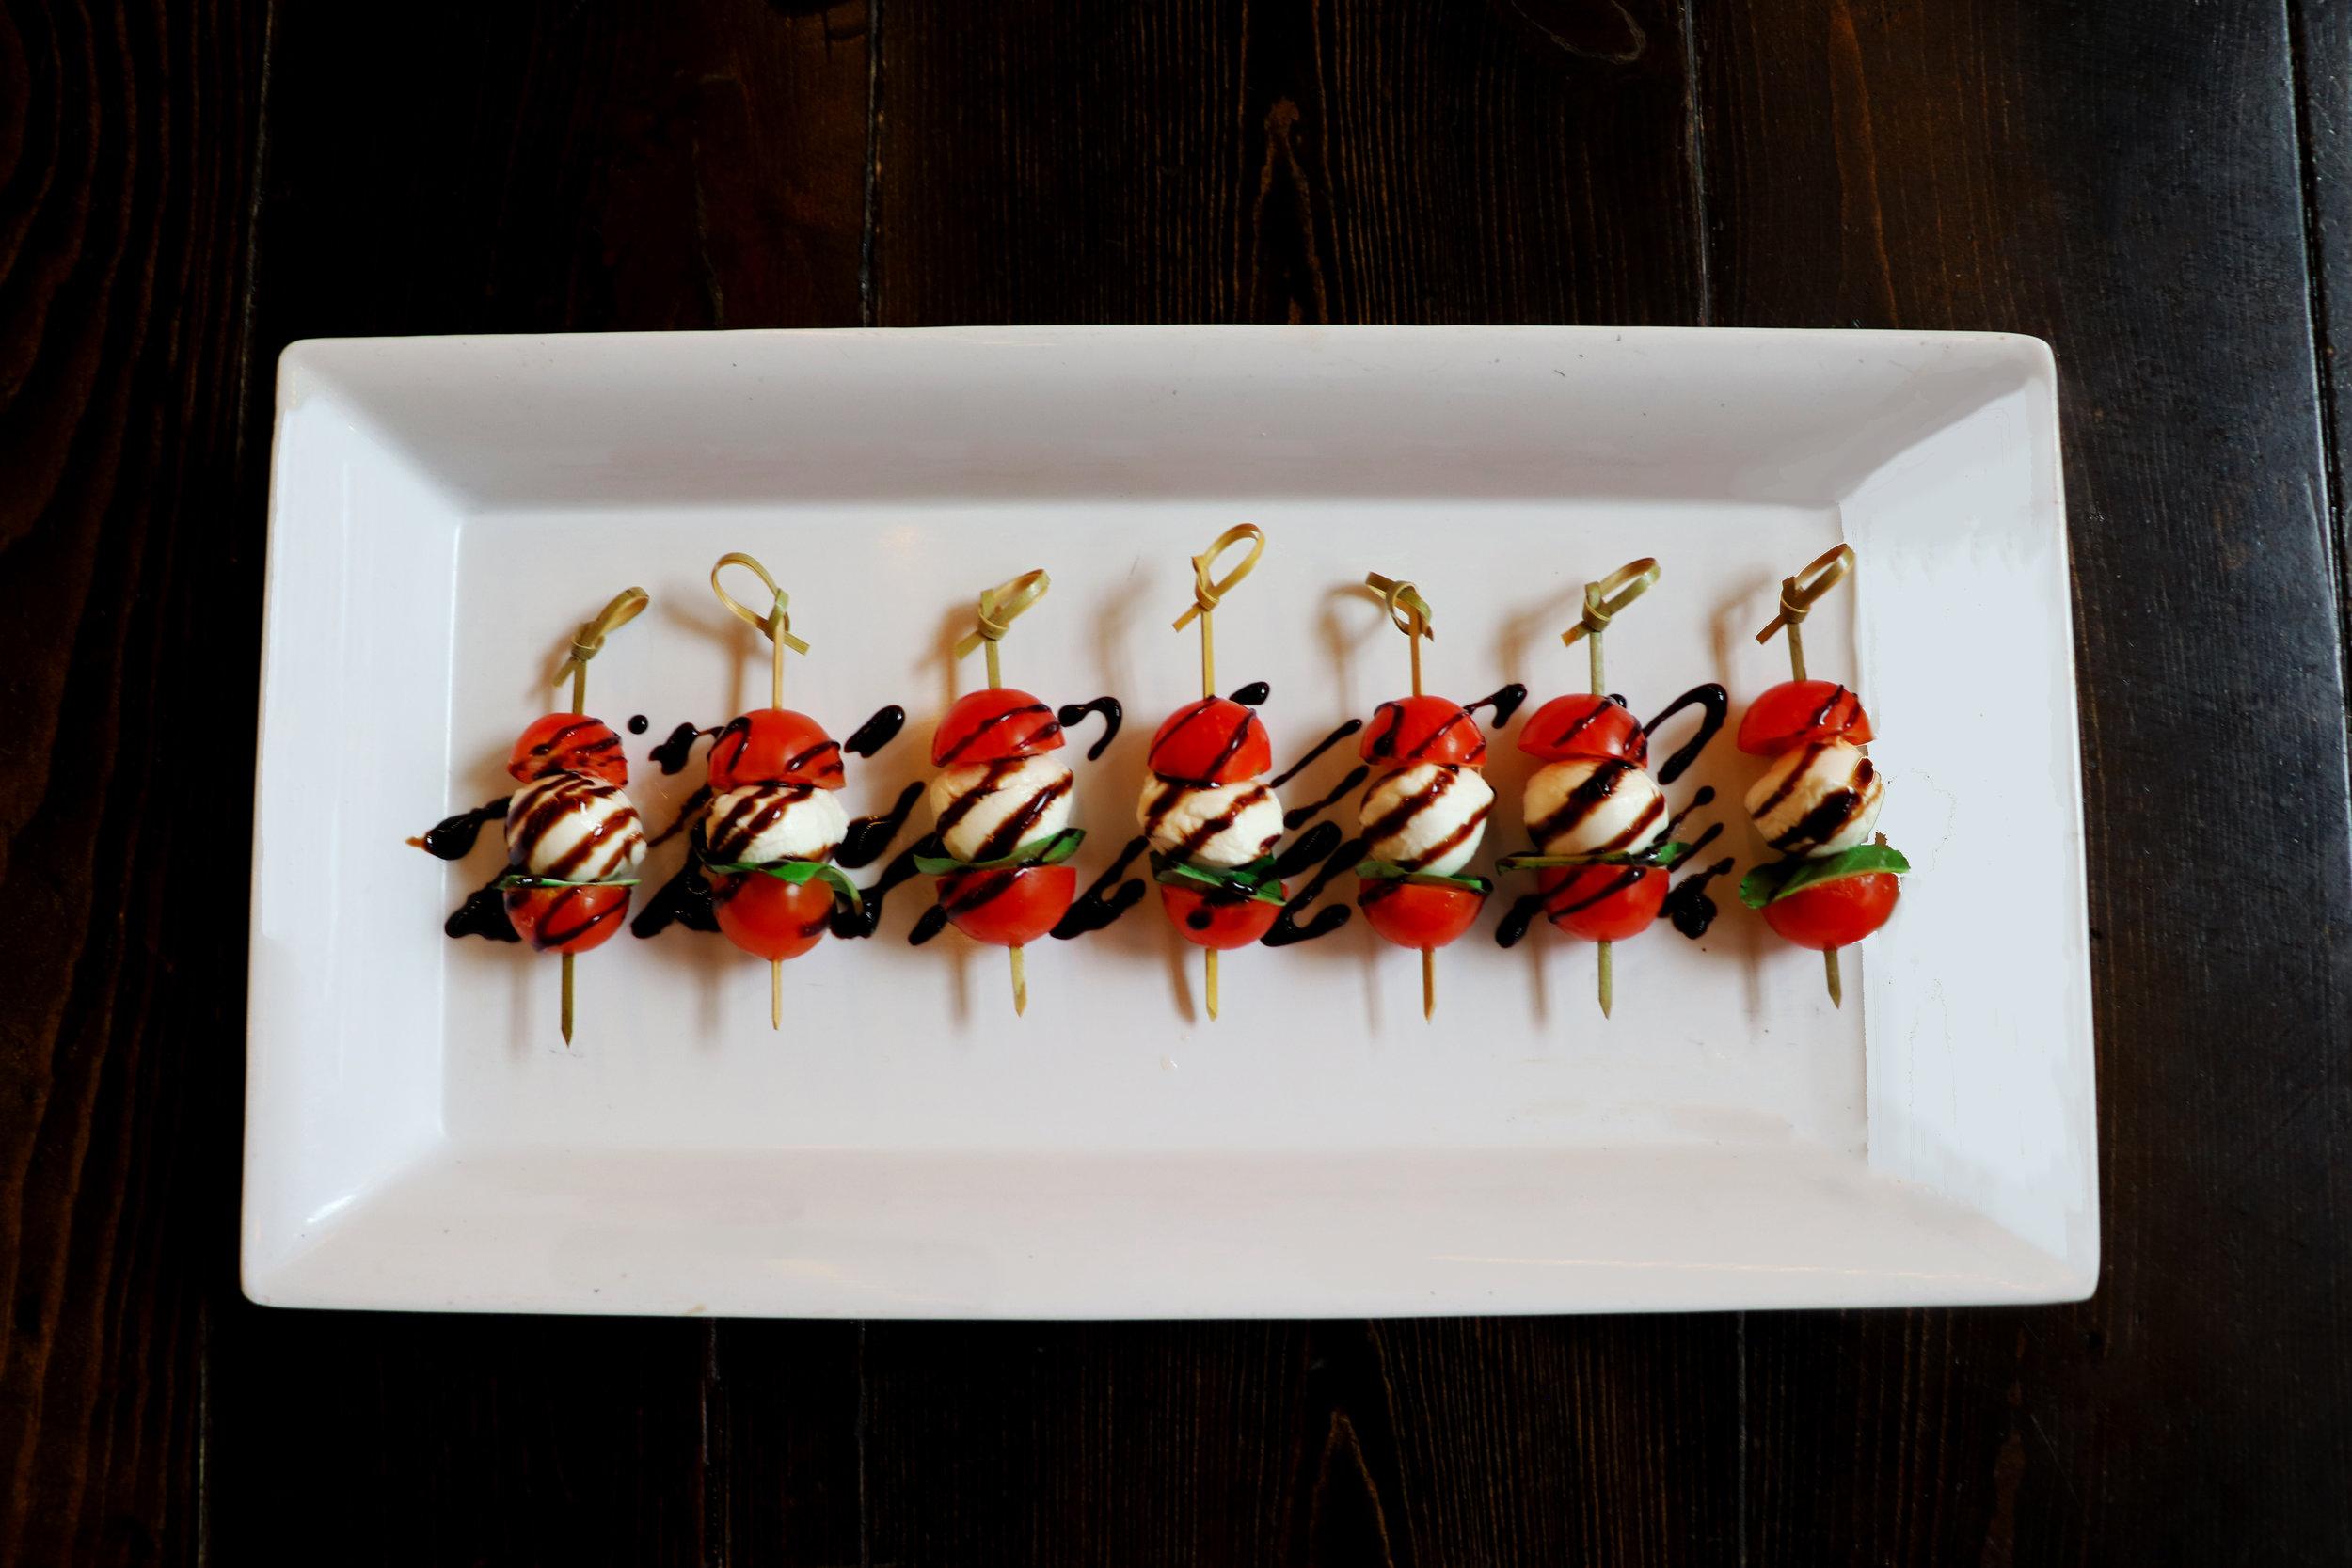 Tomato Mozzarella 1.jpg